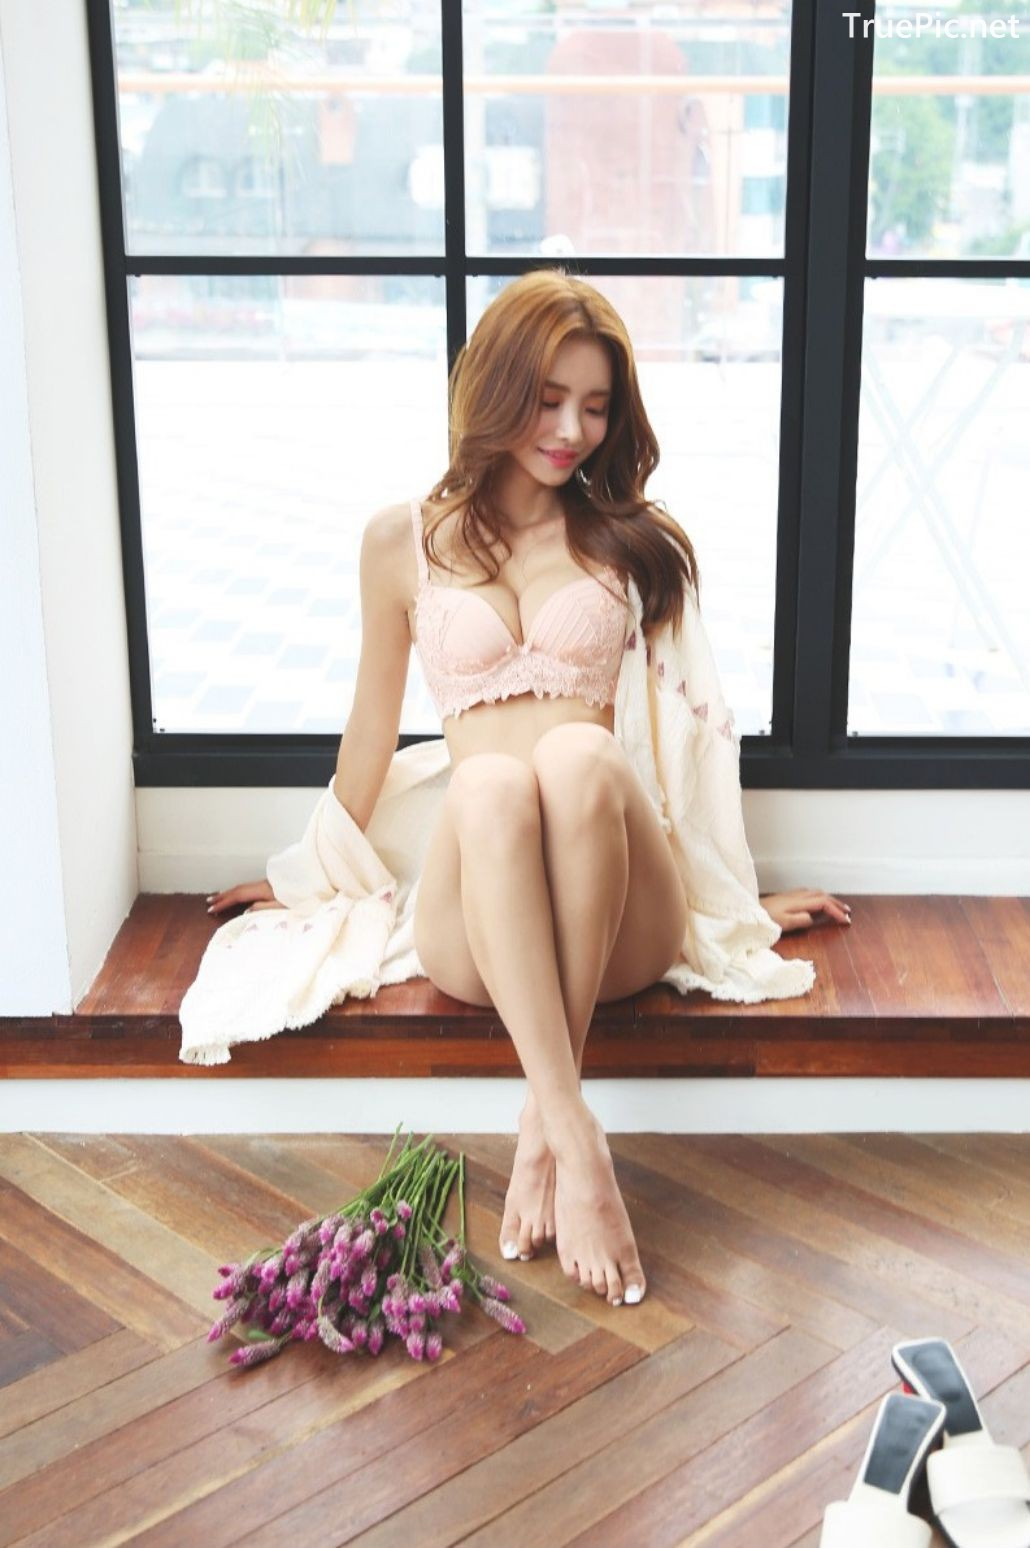 Image-Korean-Fashion Model-Shin-Eun-Ji-Various-Lingerie-Set-Collection-TruePic.net- Picture-4